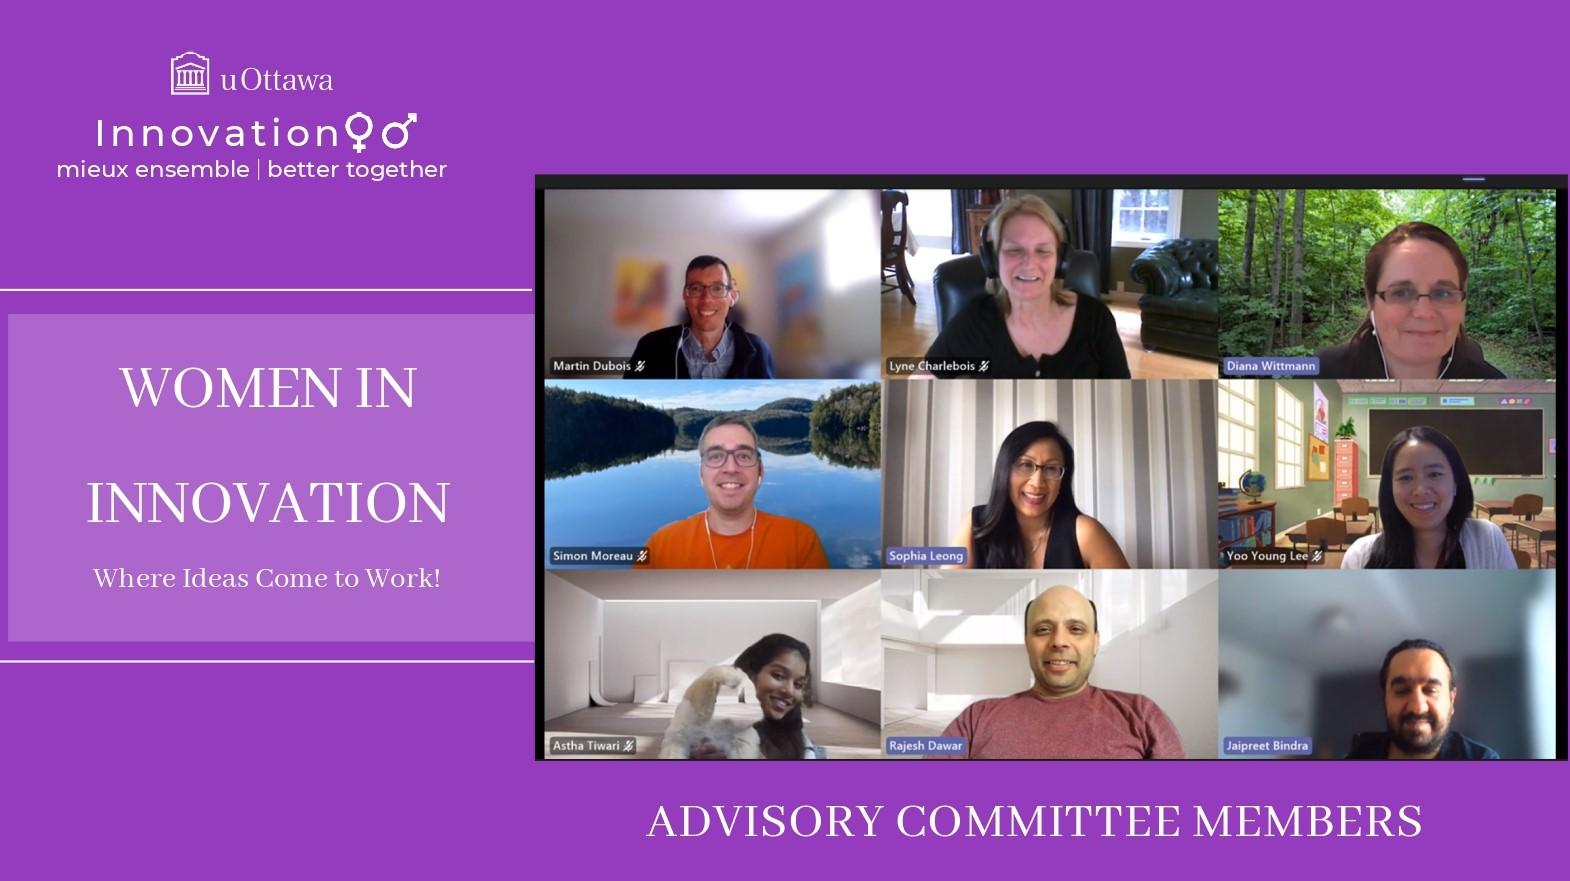 Comité consultatif Femmes en innovation - juin 2021